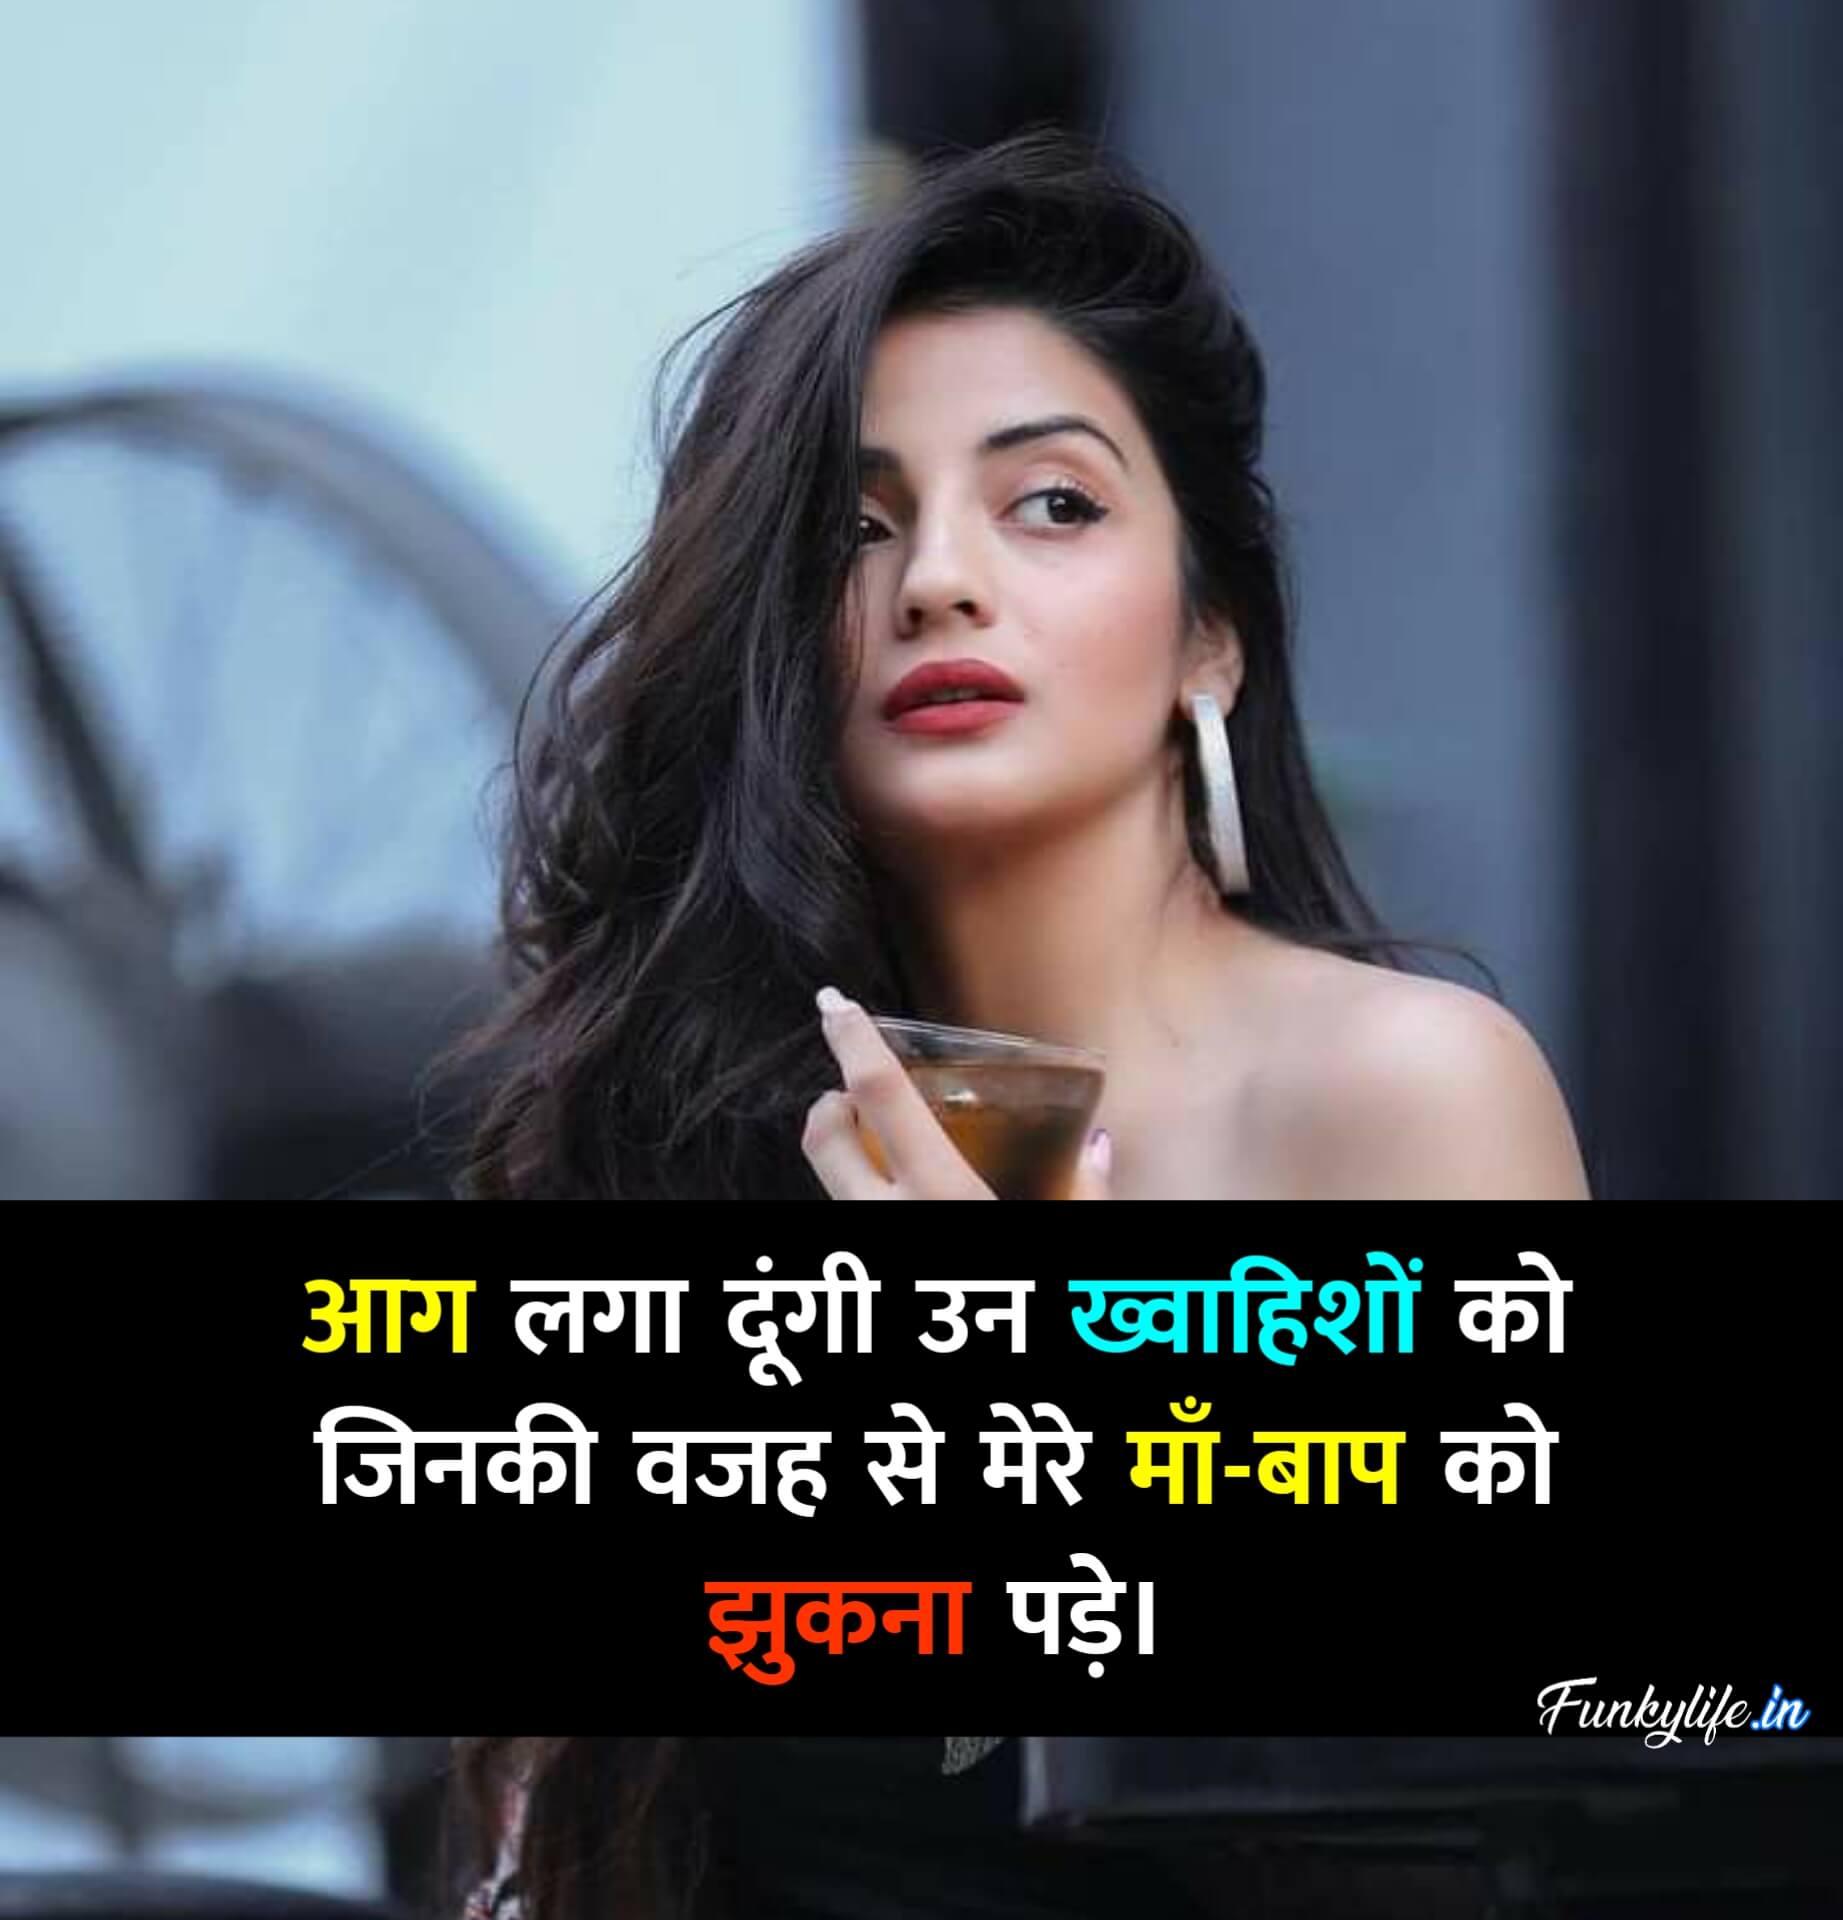 Girl Attitude Status in Hindi